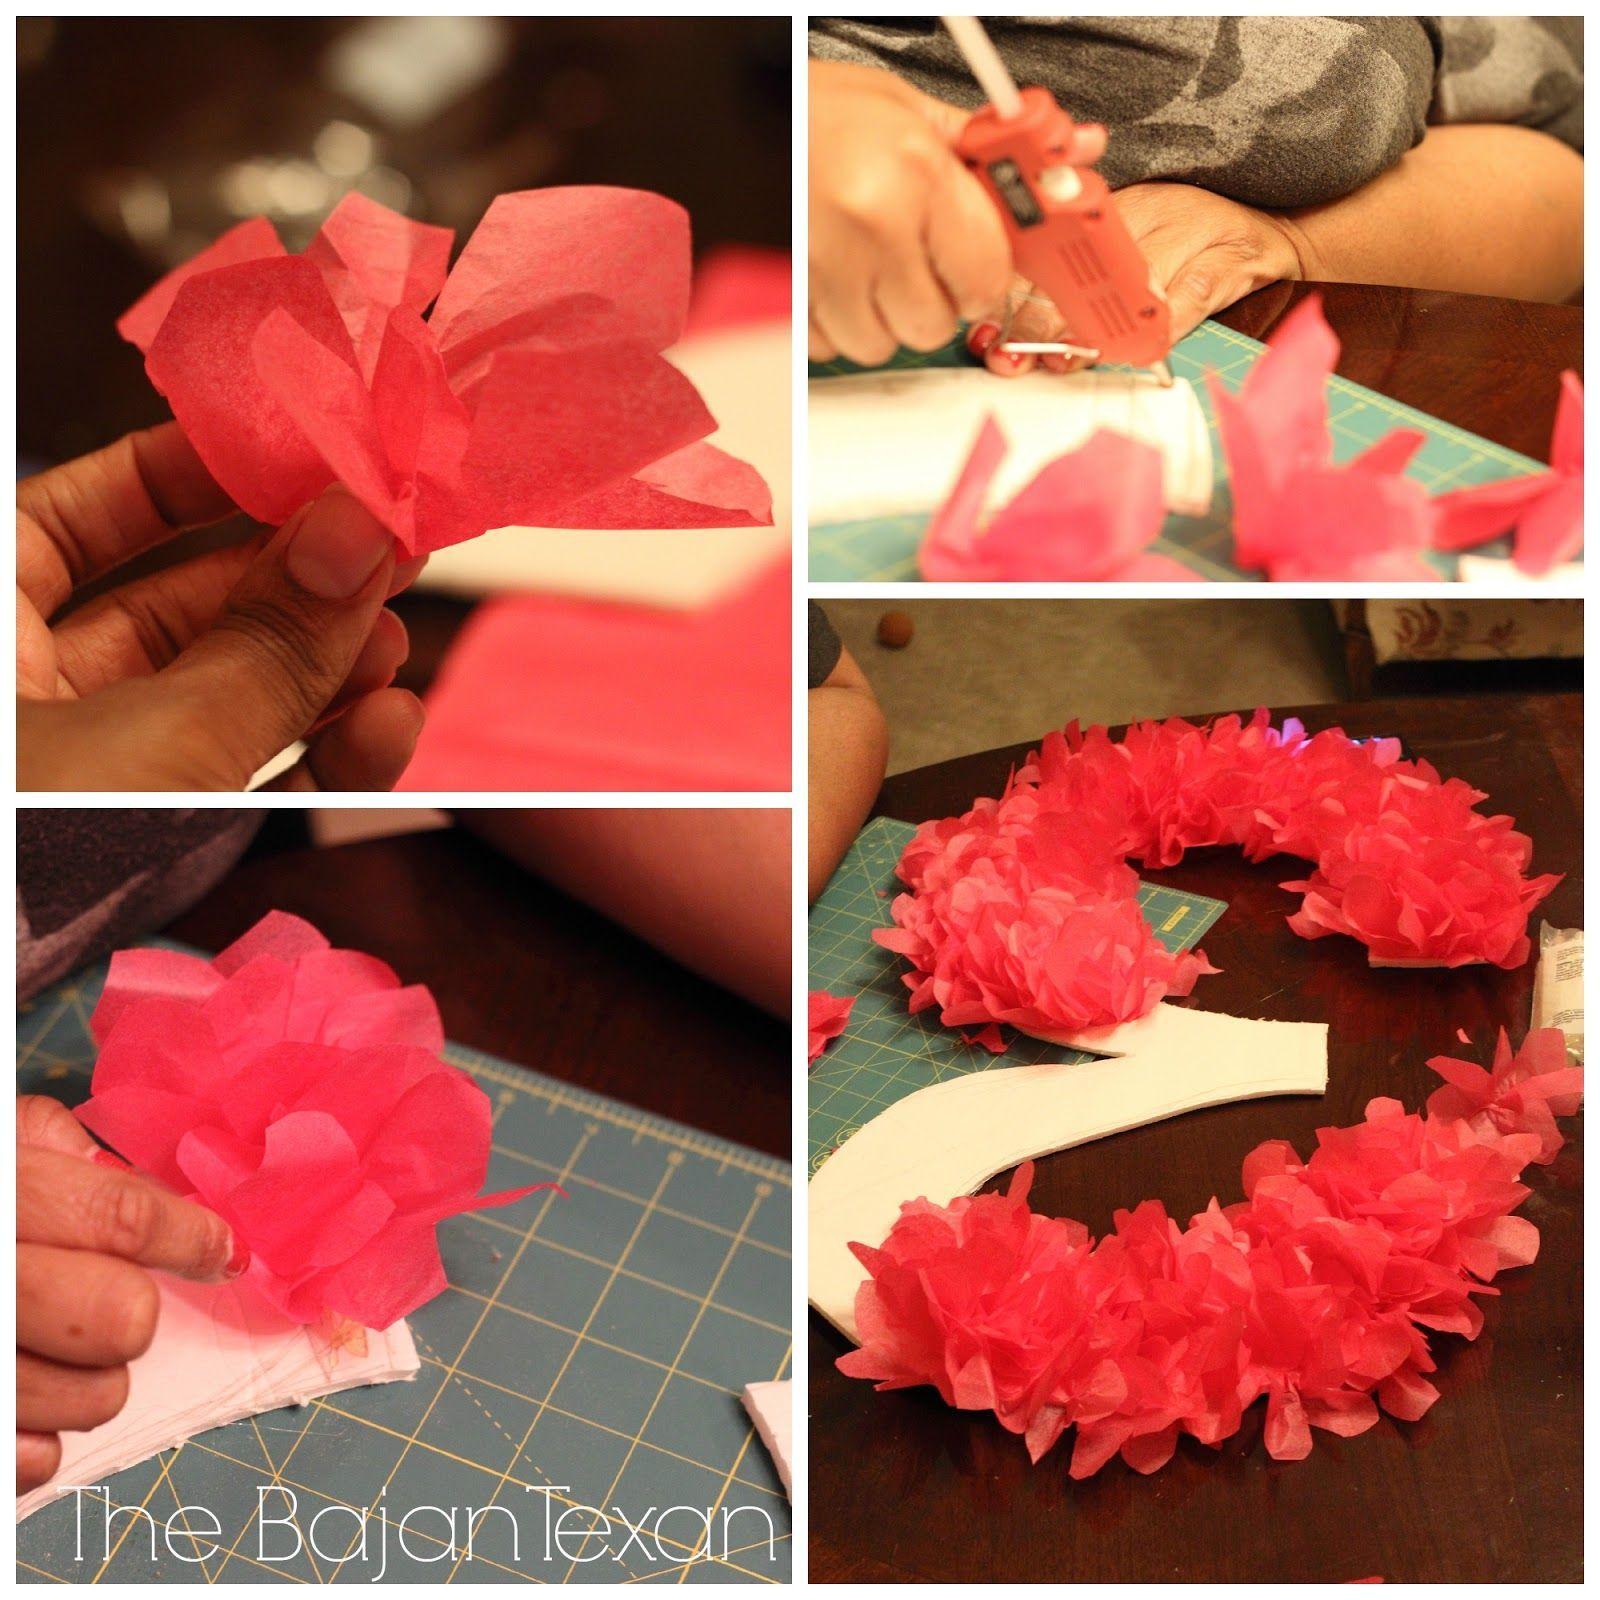 DIY Party Decor: Tissue Paper Birthday Number Sign Tutorial – The Bajan Texan -  The Bajan Texan: Tissue Paper Birthday Number Sign Tutorial (DIY Party Decor) Best Picture For  dec - #Bajan #birthday #decor #DIY #DIYHomeandDecorations #diyhomecrafts #DIYPartyDecorations #DIYWindChimes #FrameCrafts #homedecorations #number #paper #party #Sign #Texan #tissue #tutorial